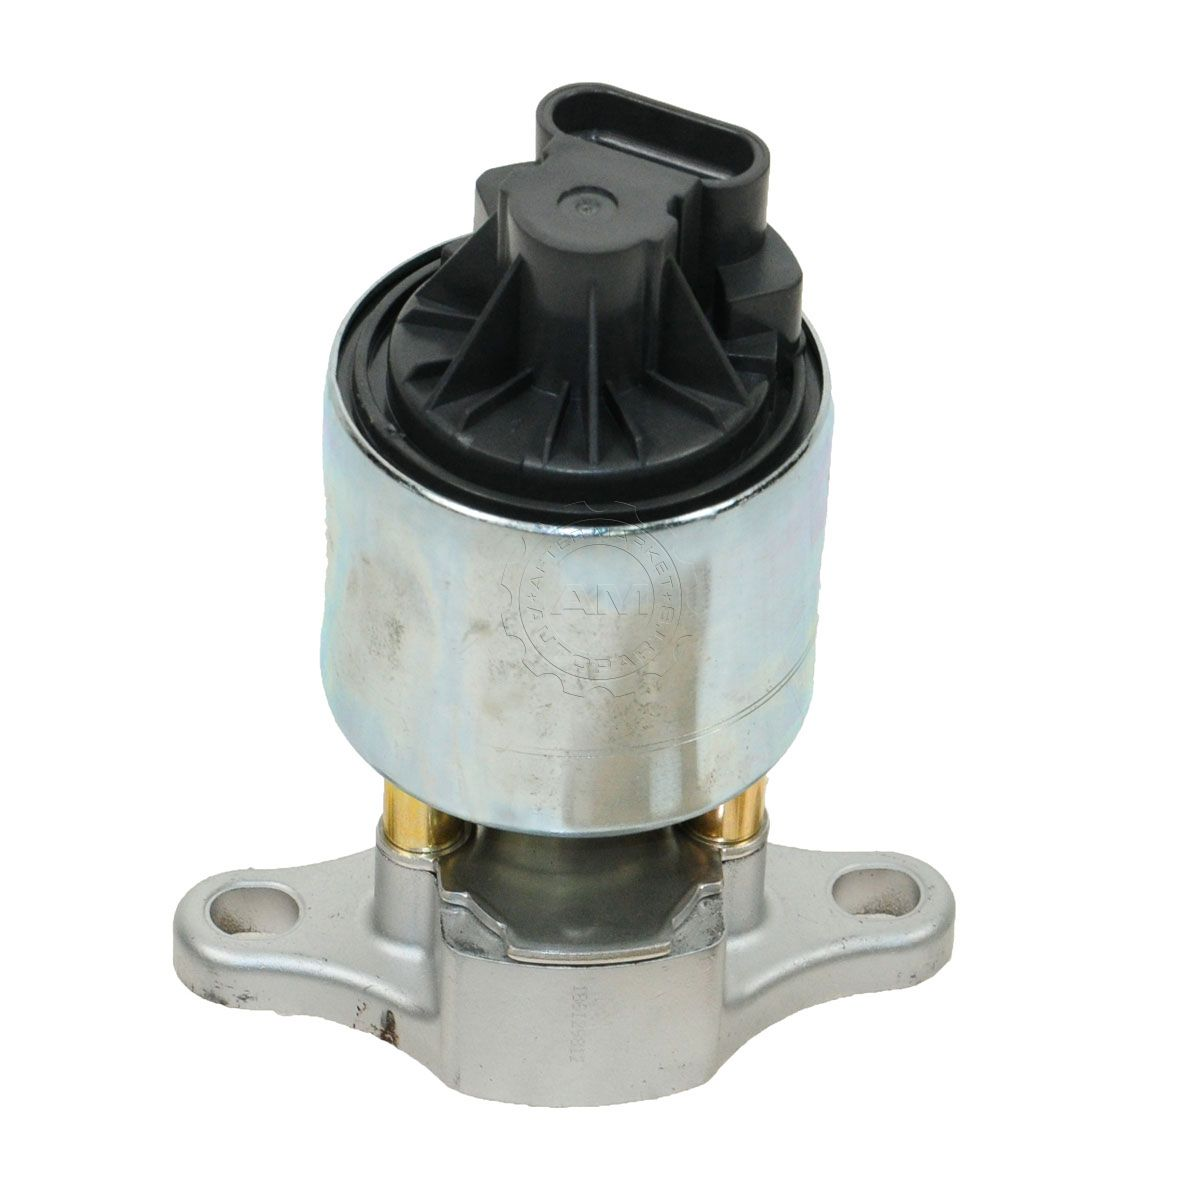 EGR Exhaust Gas Valve for Saturn SC1 SC2 SL1 SL2 SW1 SW2